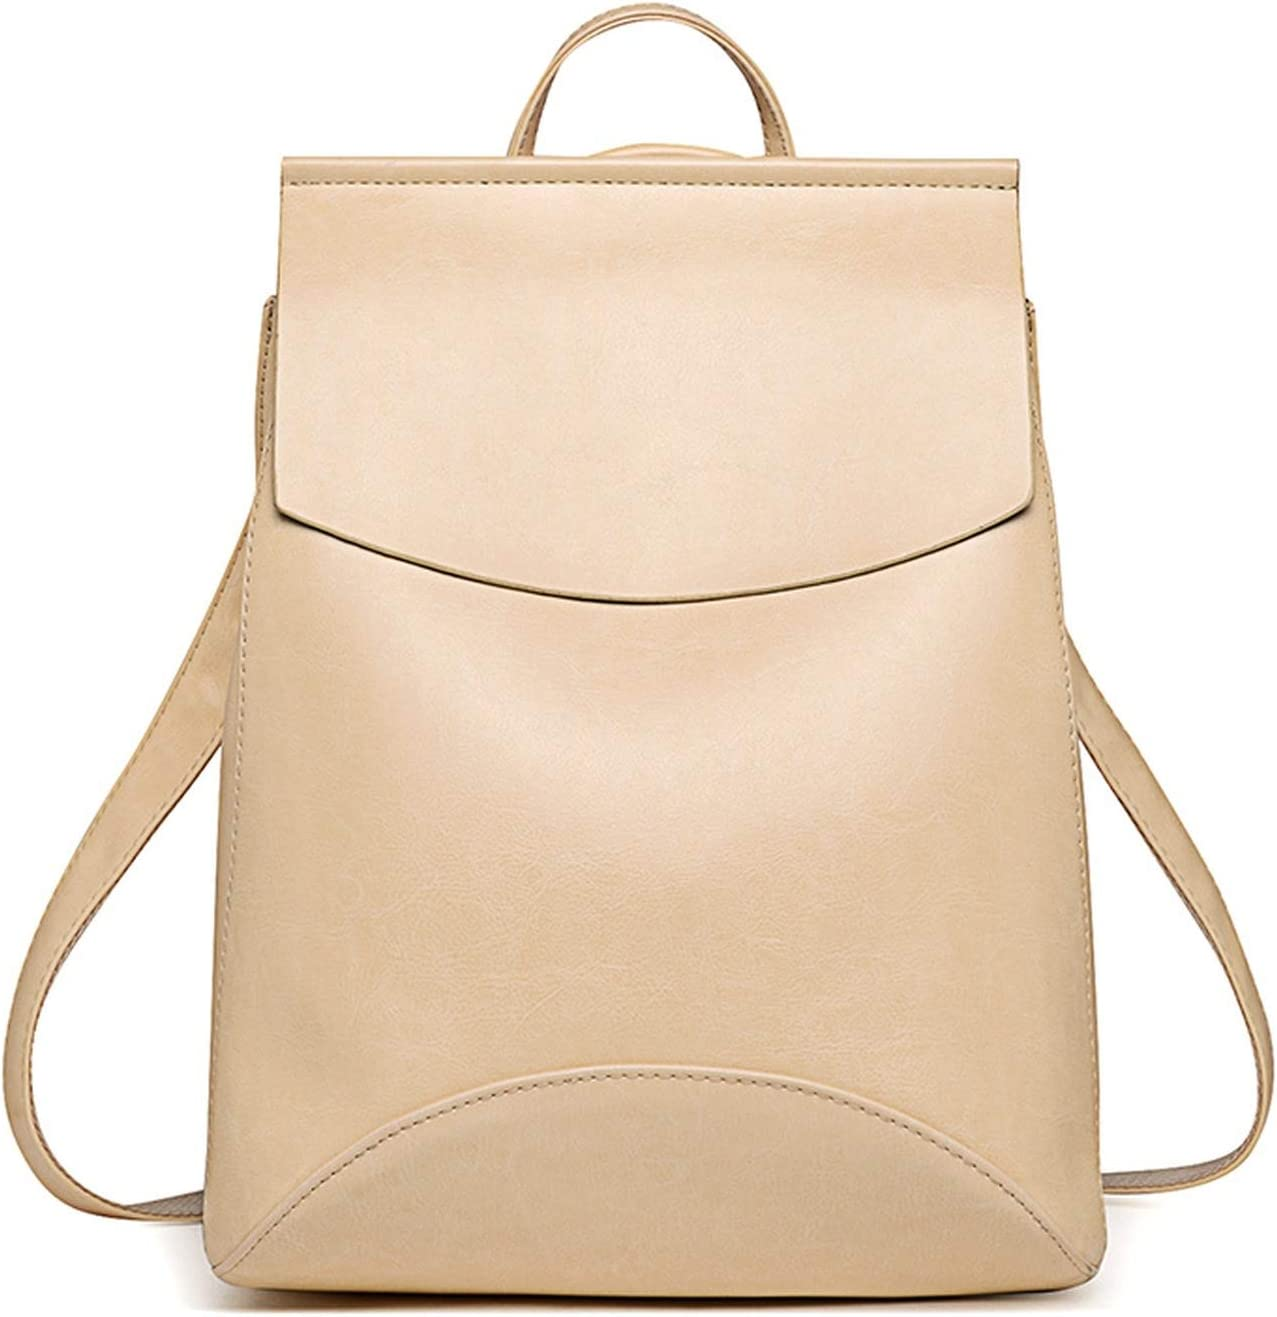 Fashion Women Backpack Youth Leather Backpacks For Teenage Girls Female School Shoulder Bag,Silver